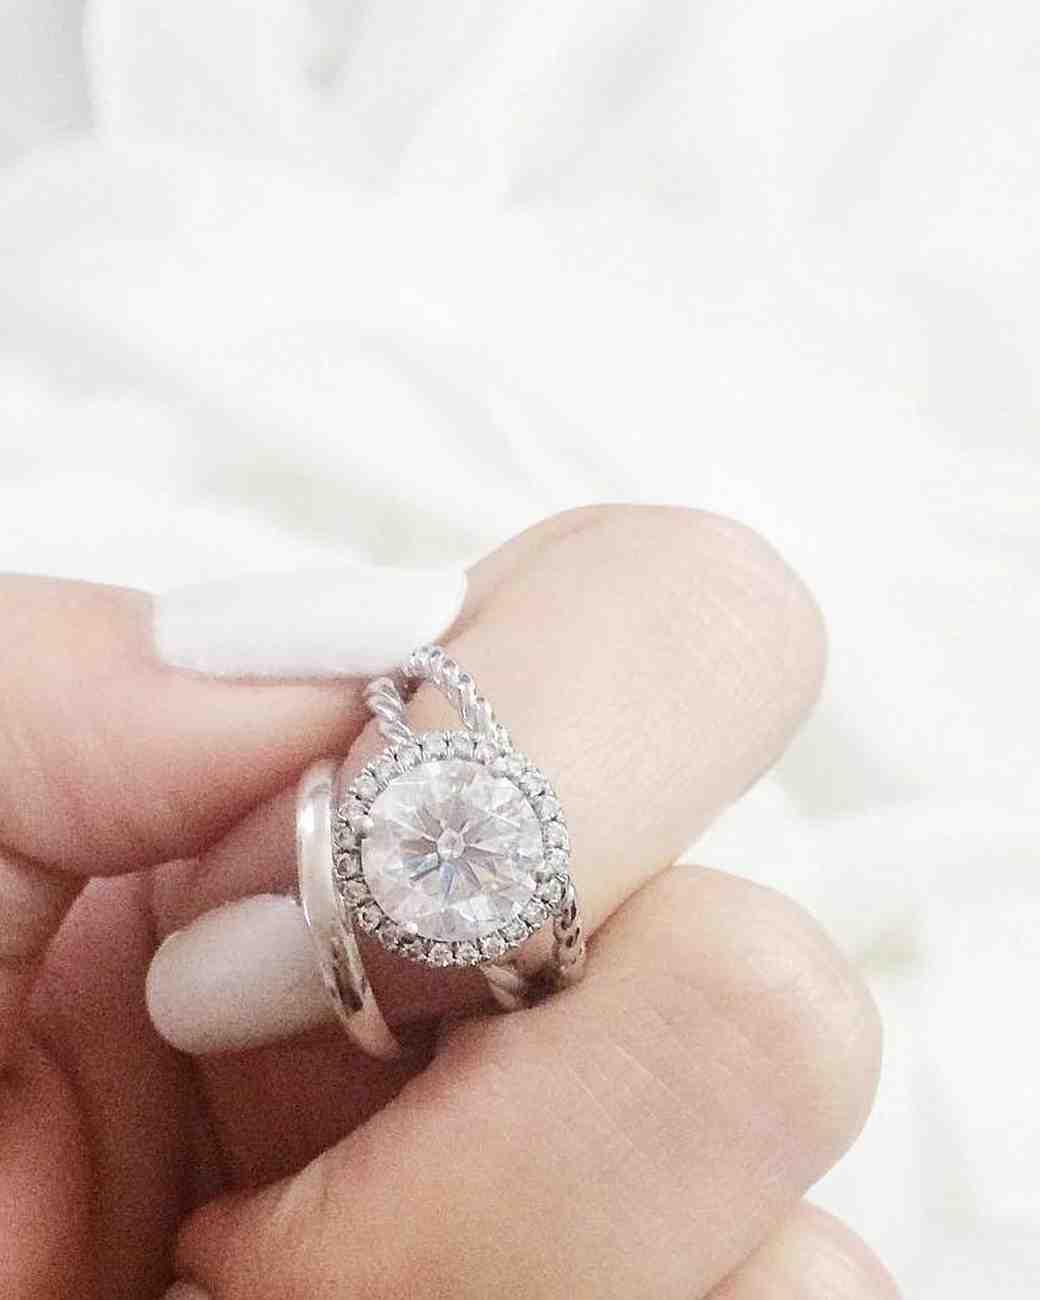 engagement-ring-selfies-white-sheets-0216.jpg